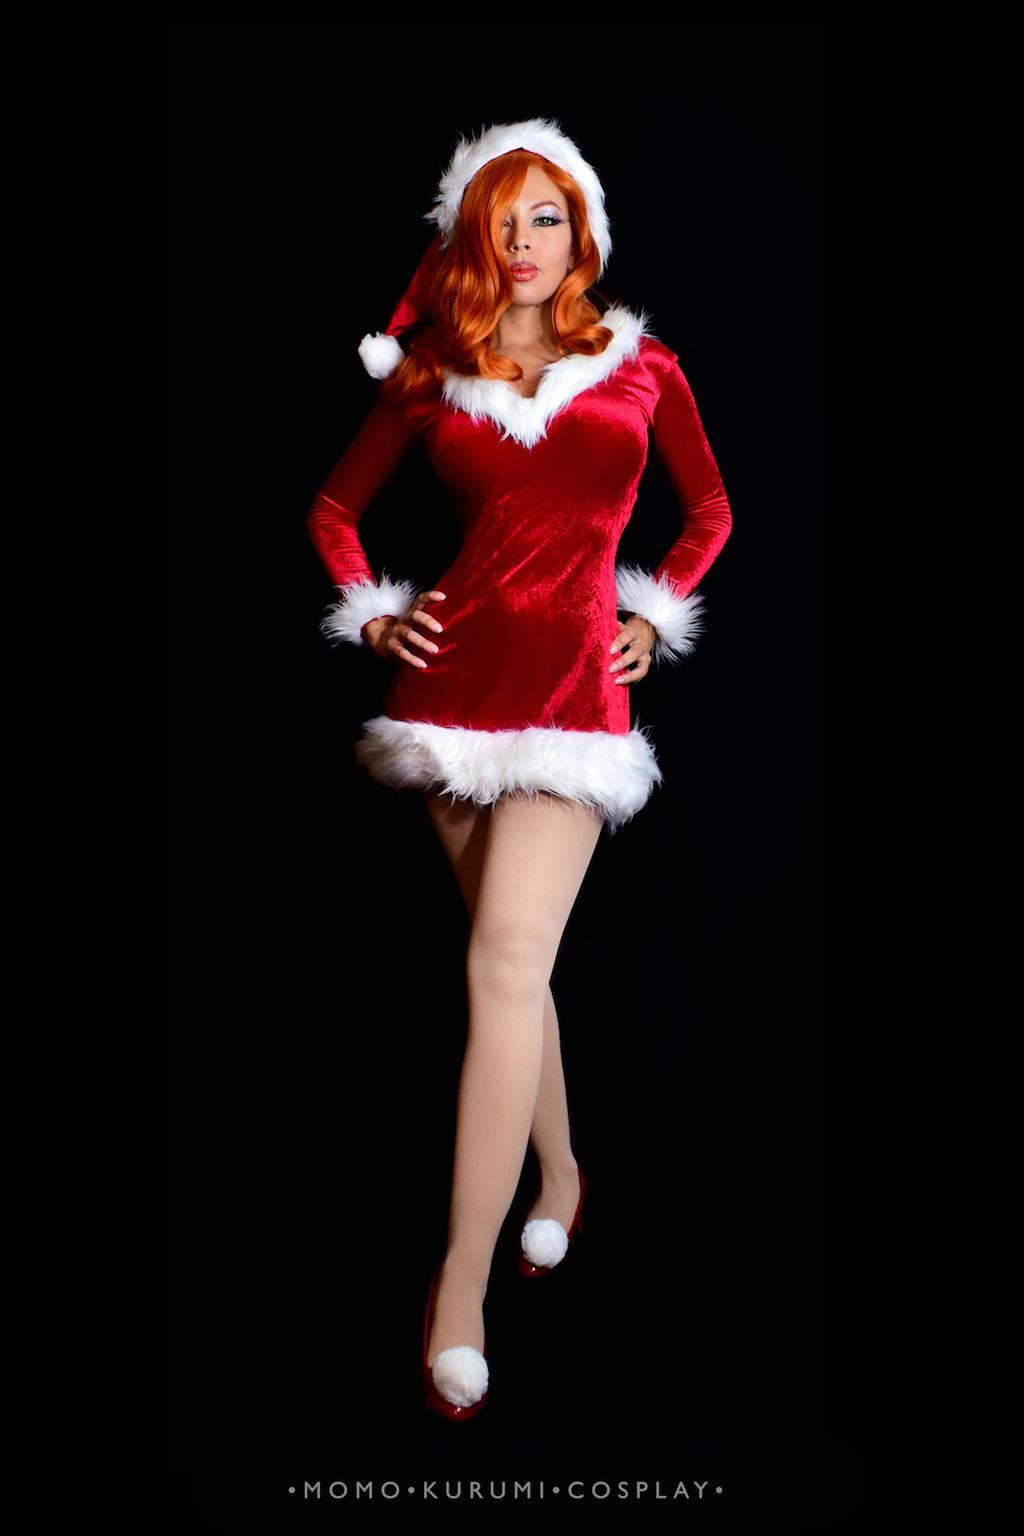 Jessica Rabbit: All I Want For Christmas By MomoKurumi On